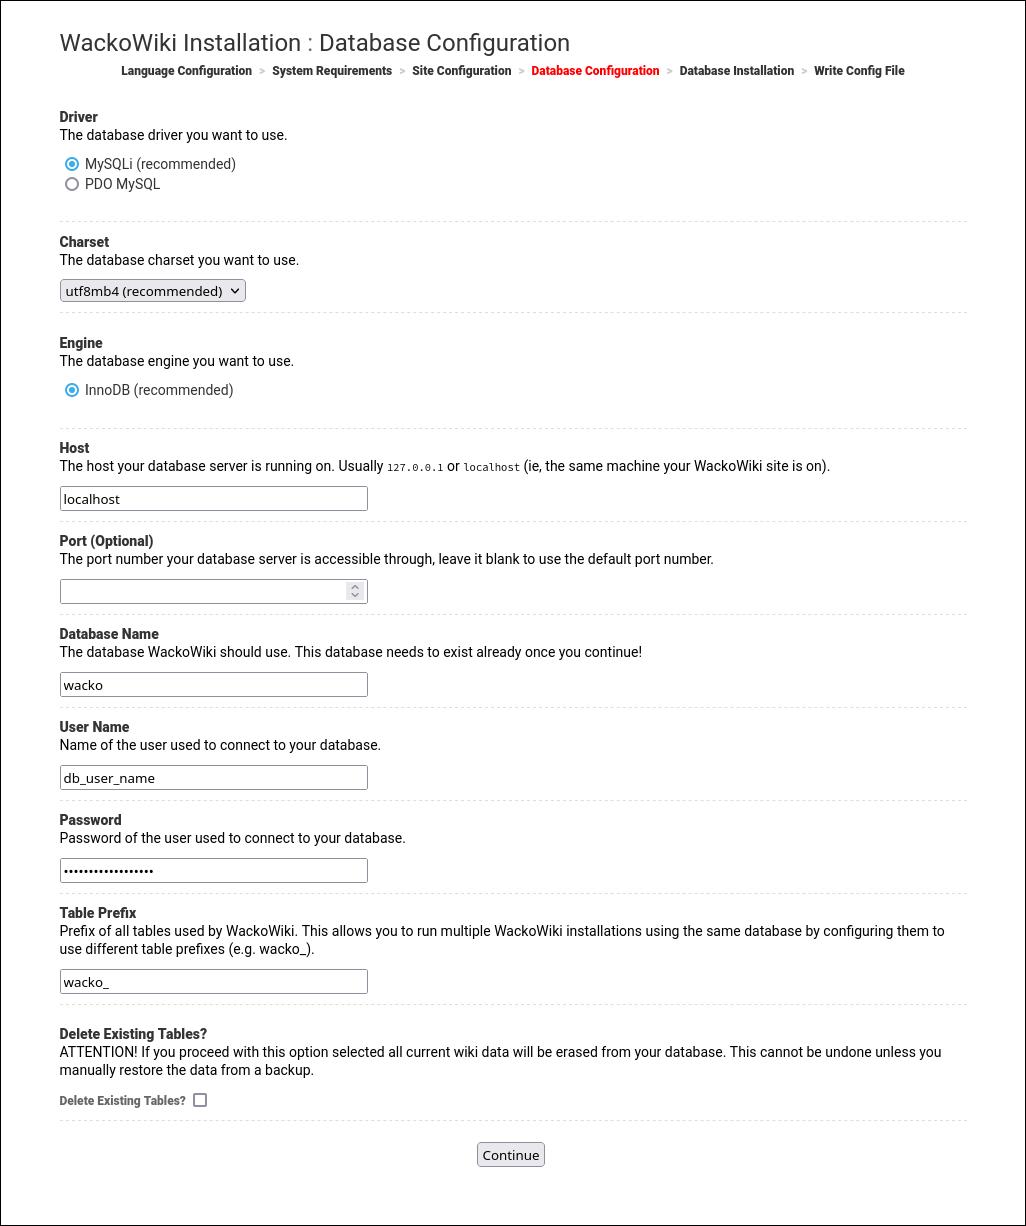 Screenshot: WackoWiki R6.0 installation step 4: database configuration